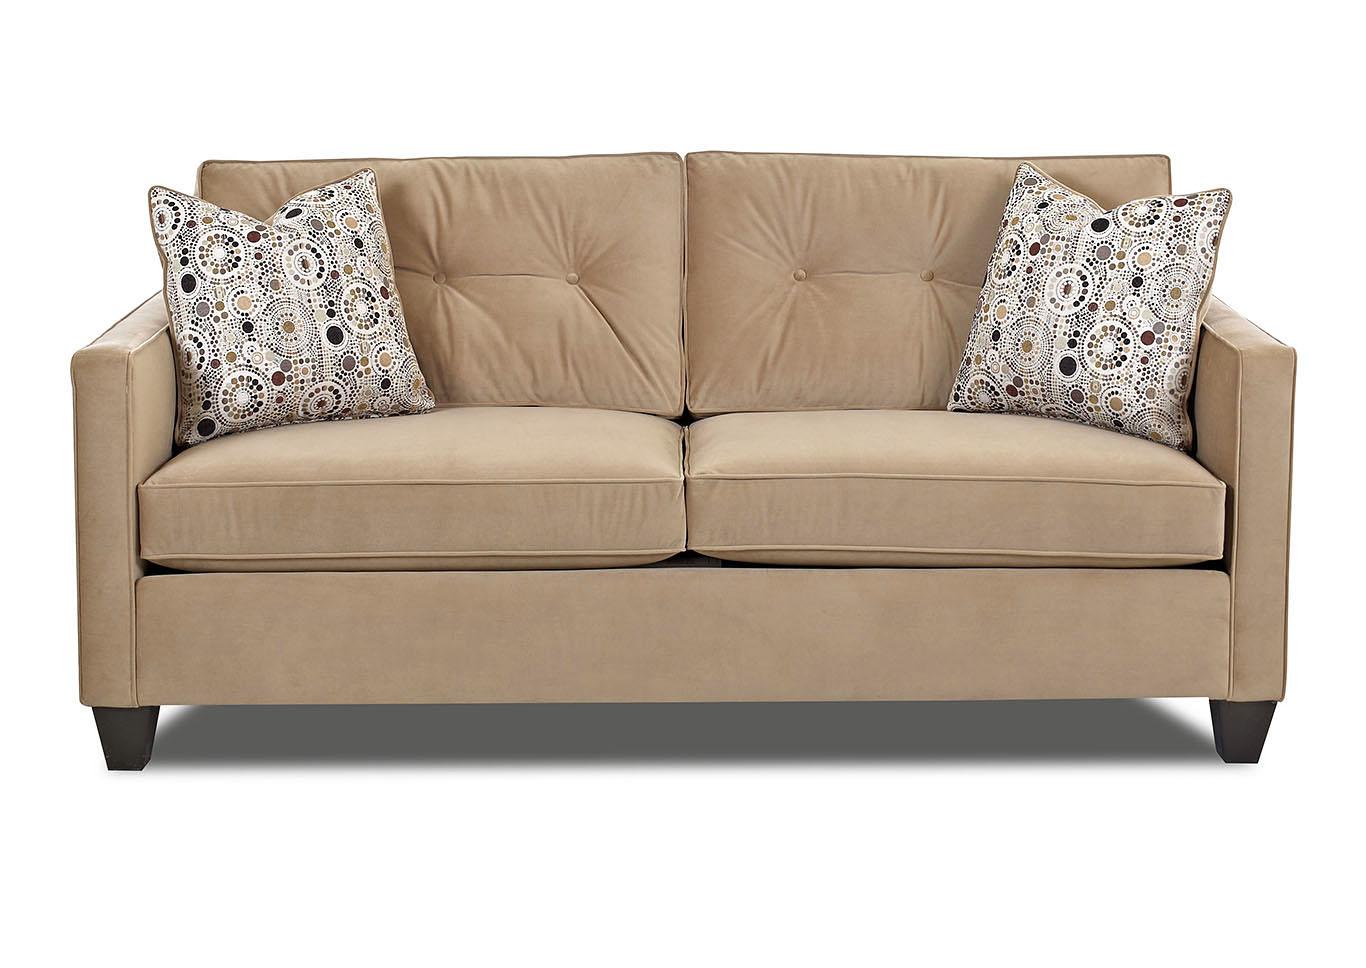 Amite City Furniture